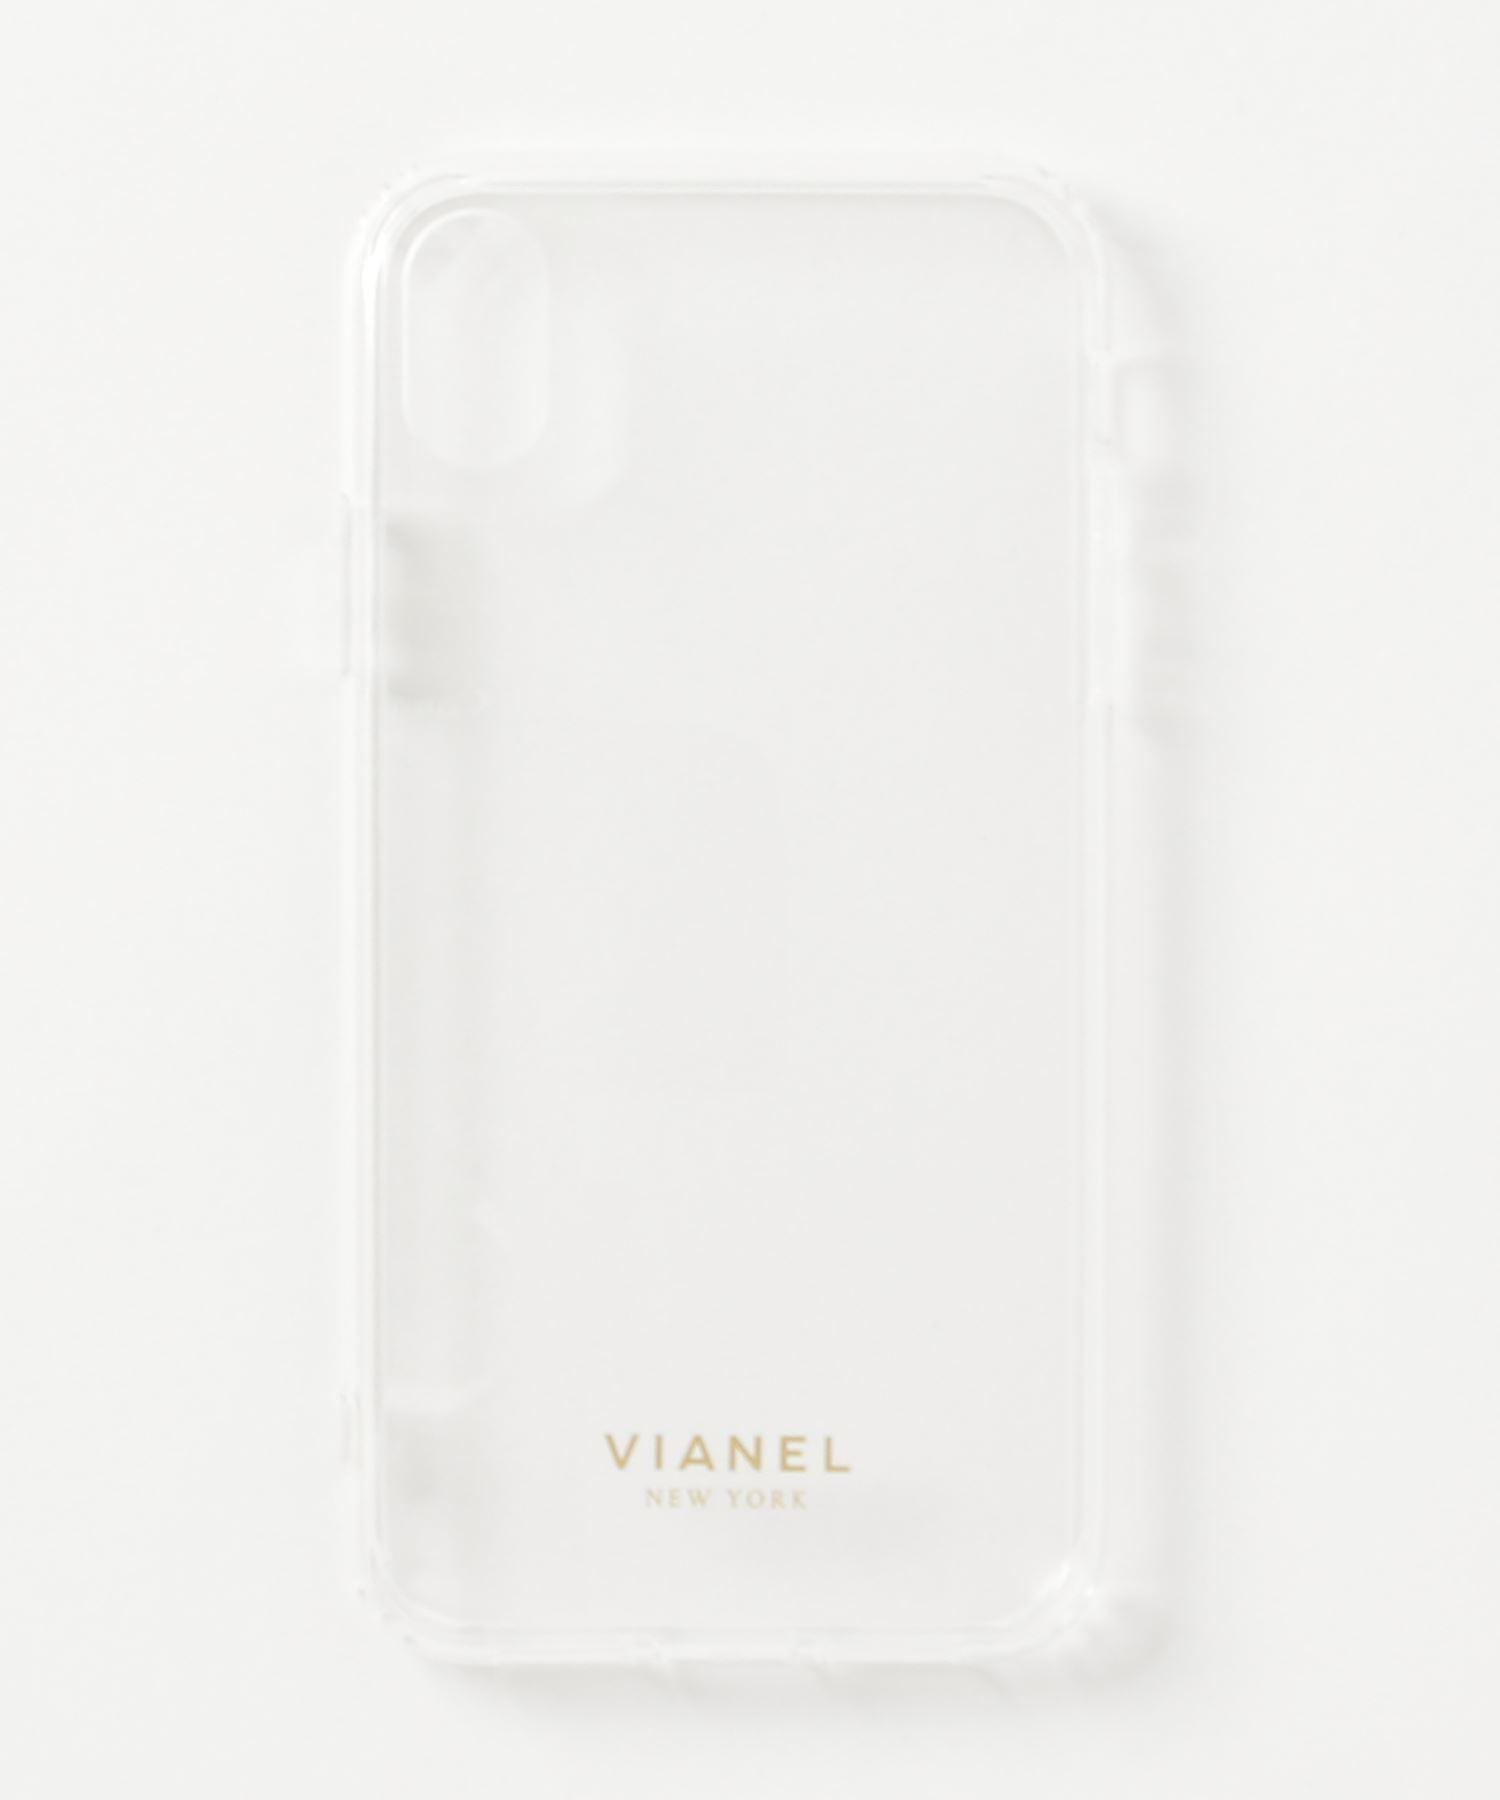 VIANEL NEW YORK / IPHONE FLEX CASE CLEAR XR